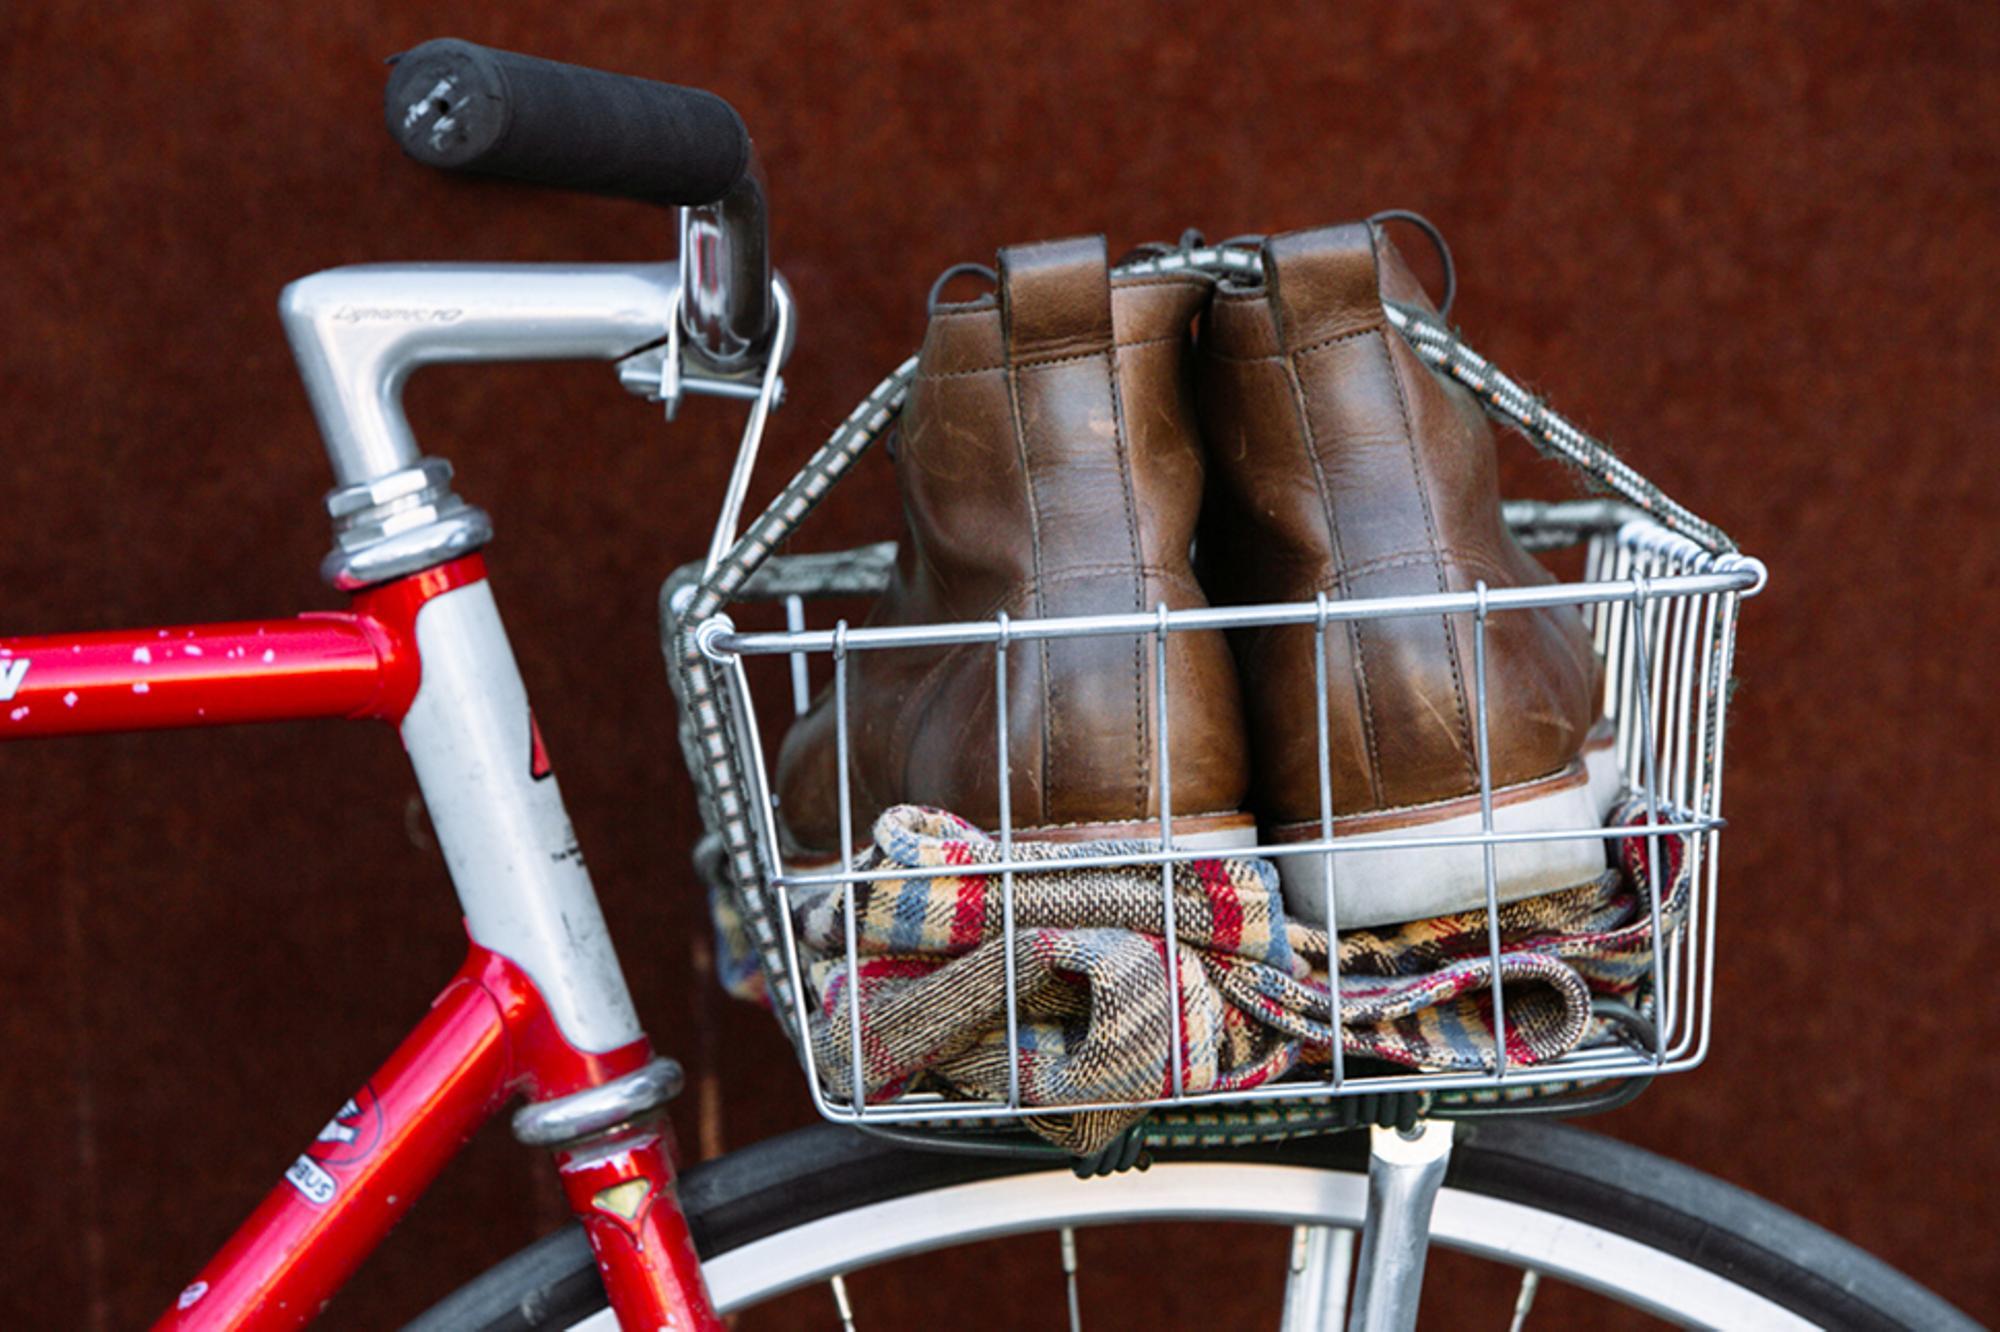 Beautiful Bicycle: Matt's Samson Basket Track